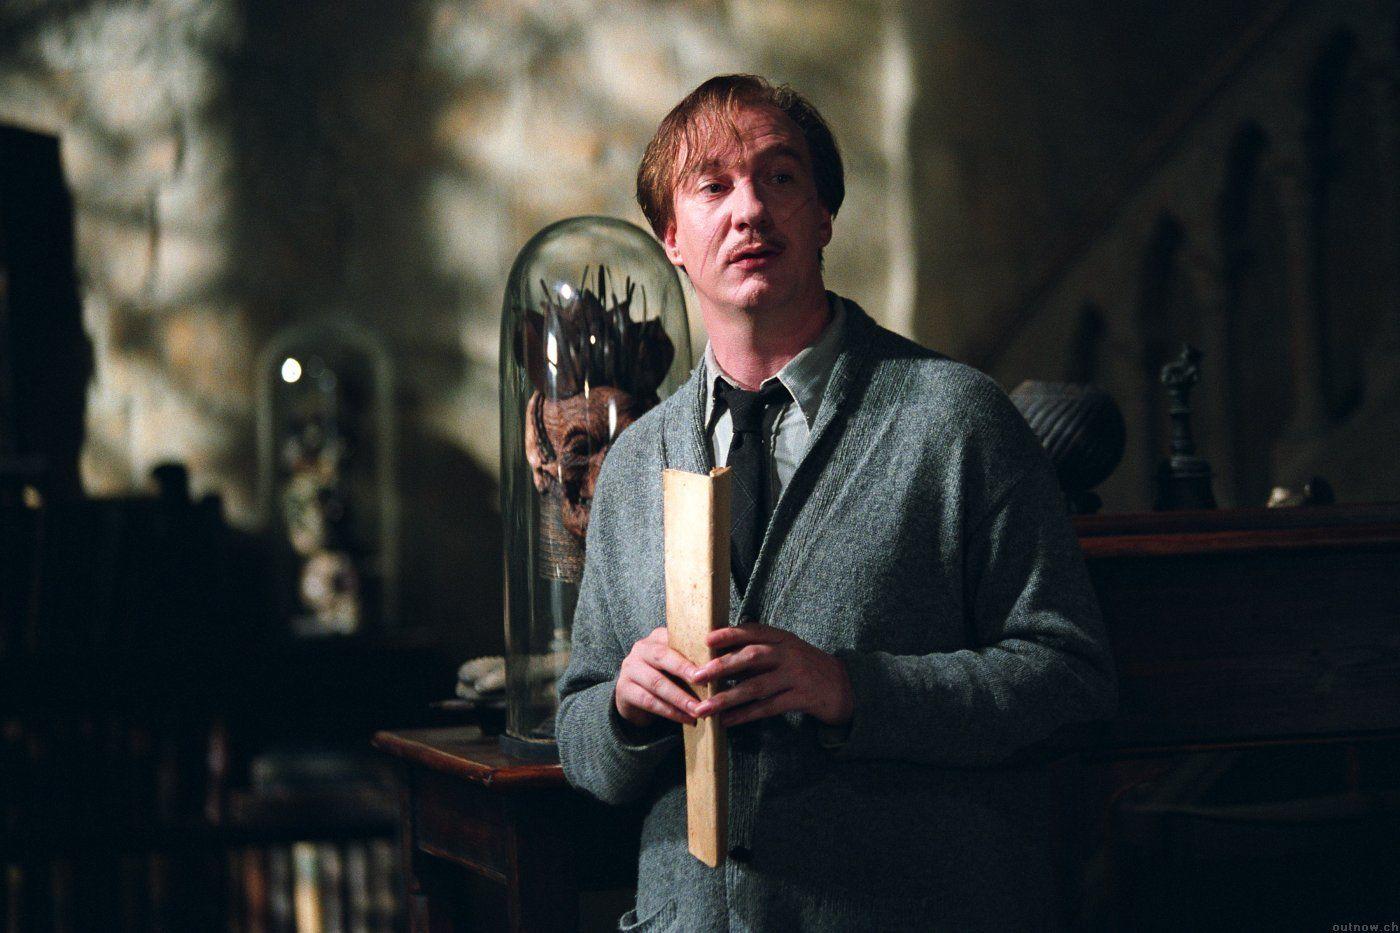 Pin Von Sonny Auf Platform 9 Harry Potter Fakten Harry Potter World Hogwarts